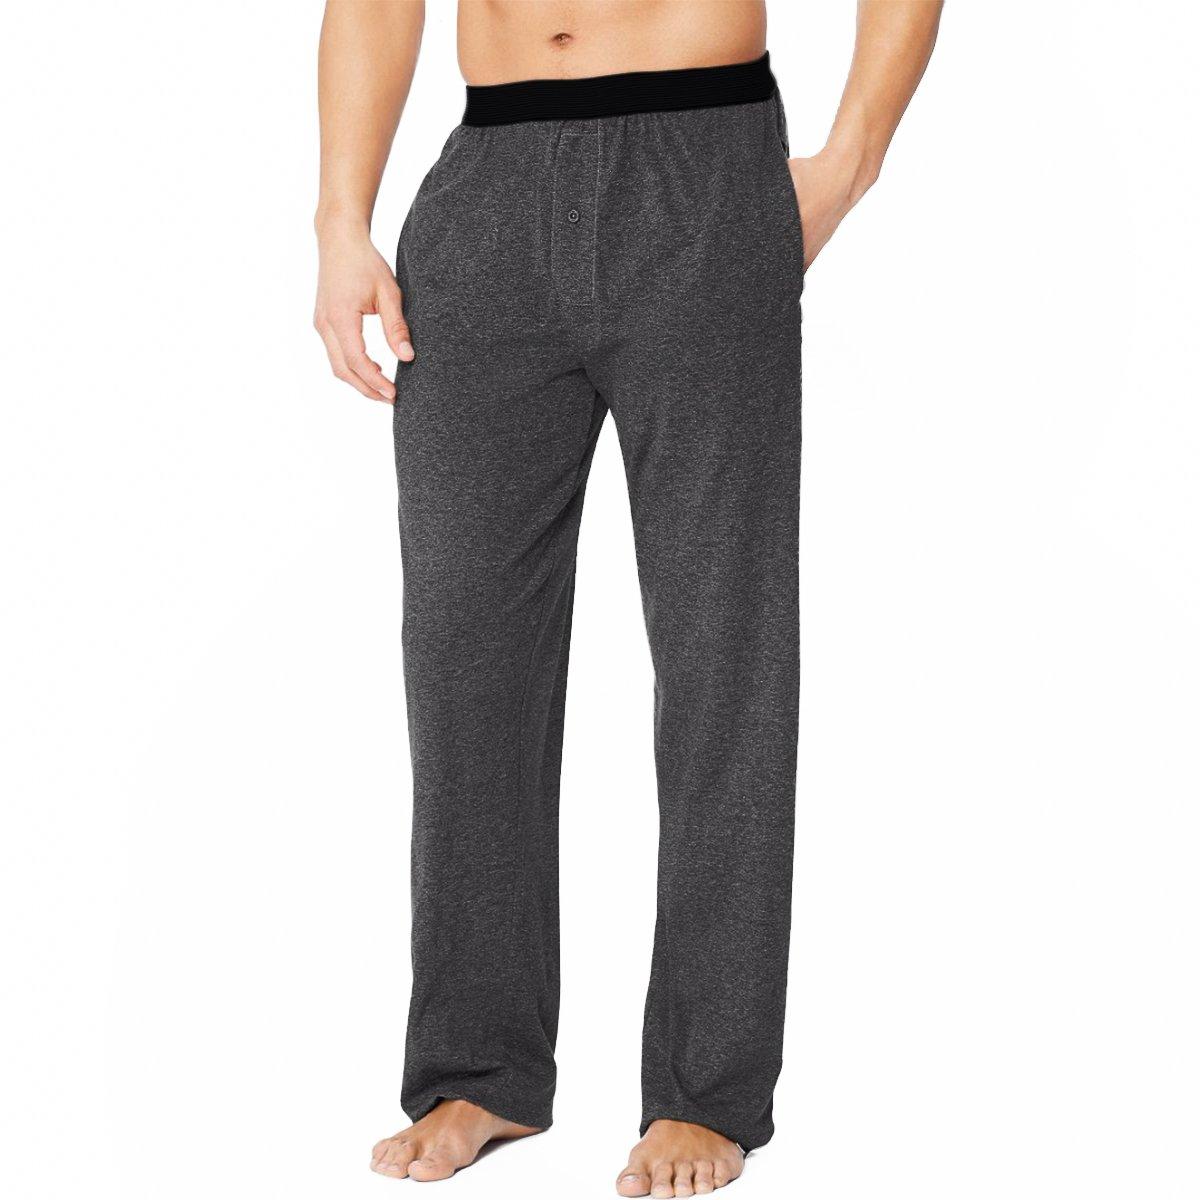 Ecko Knit Sleep Pants for Men Pajamas for Boys Teen Super Soft Lounge Pants Men with Pockets Cool Sleeping Pajamas Adult PJs